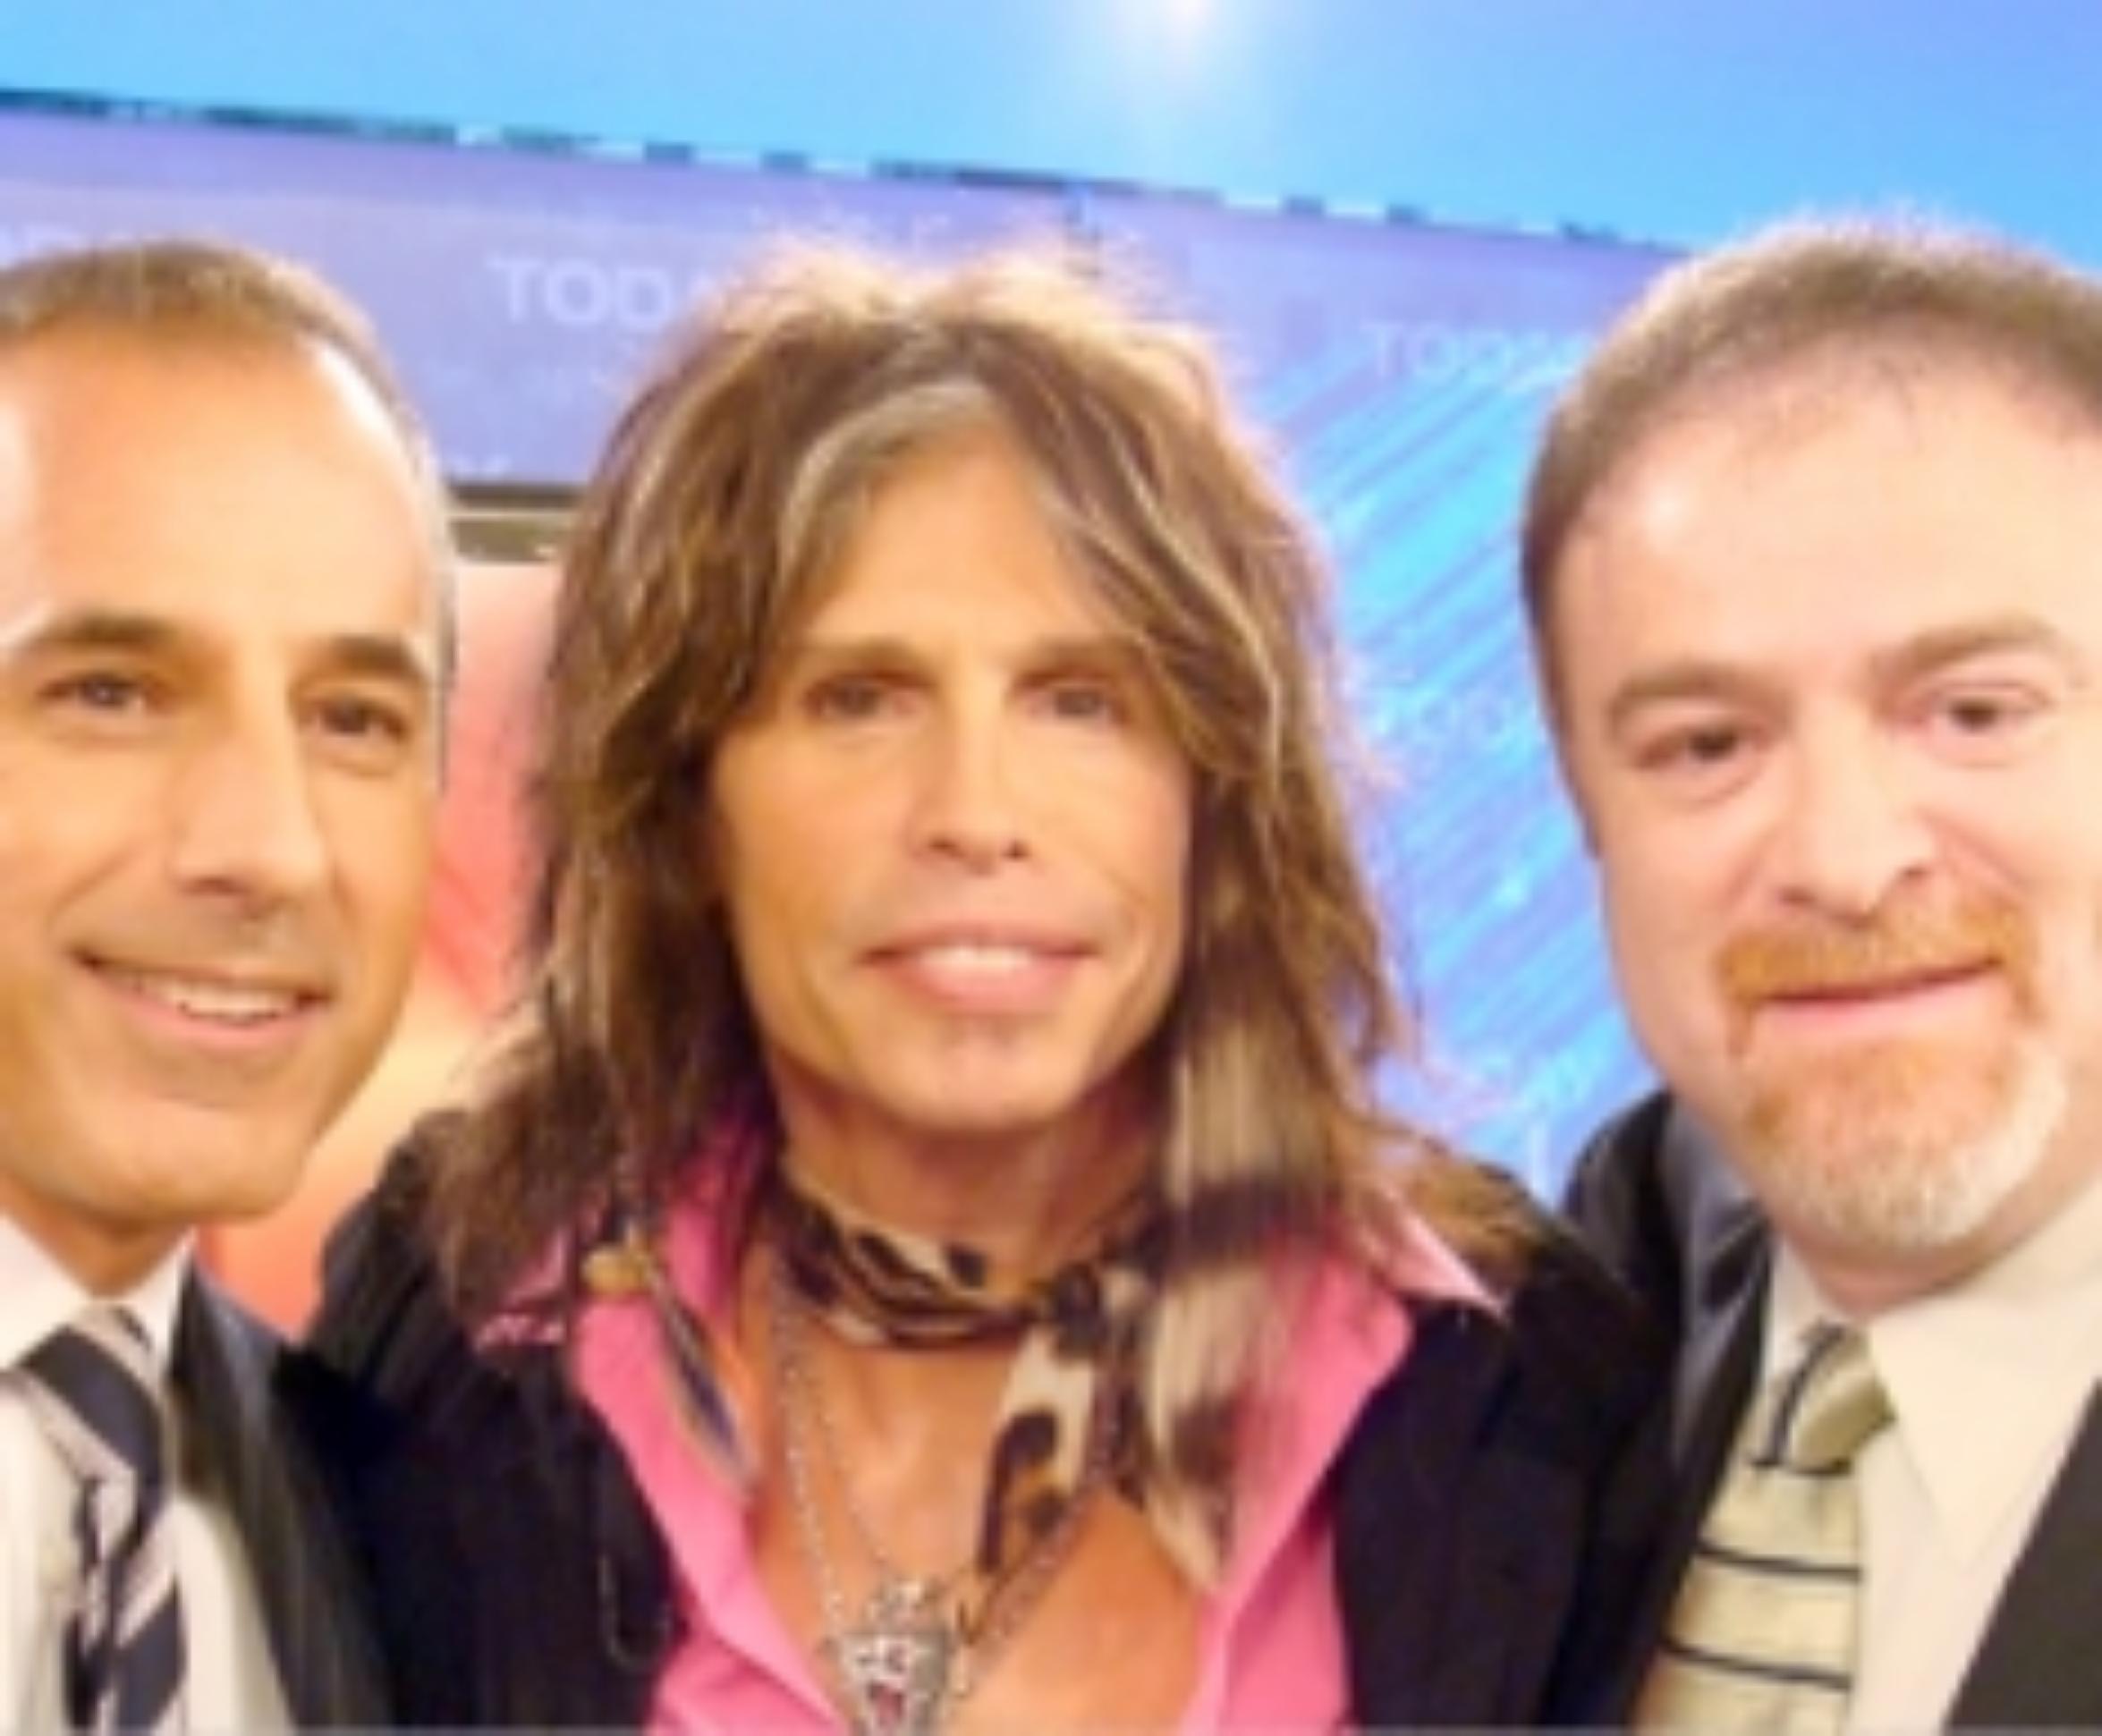 MATT LAUER, STEVEN TYLER, AND DR. STEVEN ZEITELS AT NBC STUDIOS IN NEW YORK